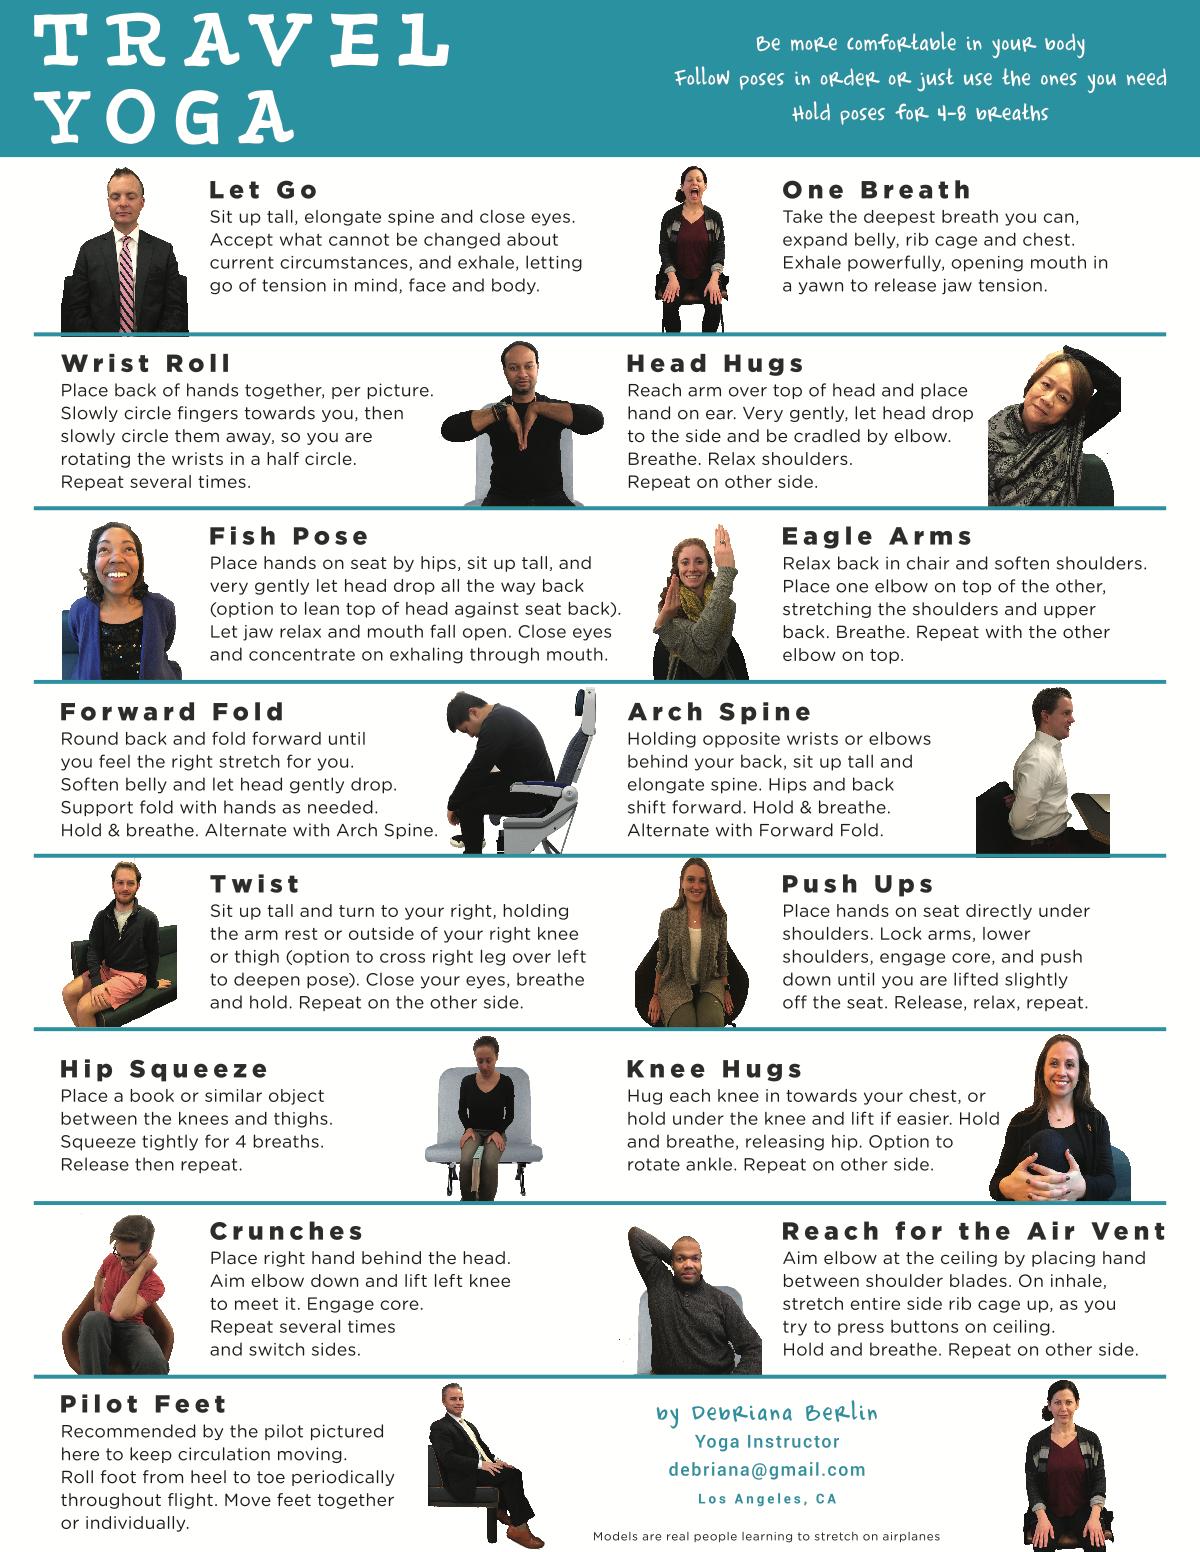 Airplane to Travel Yoga